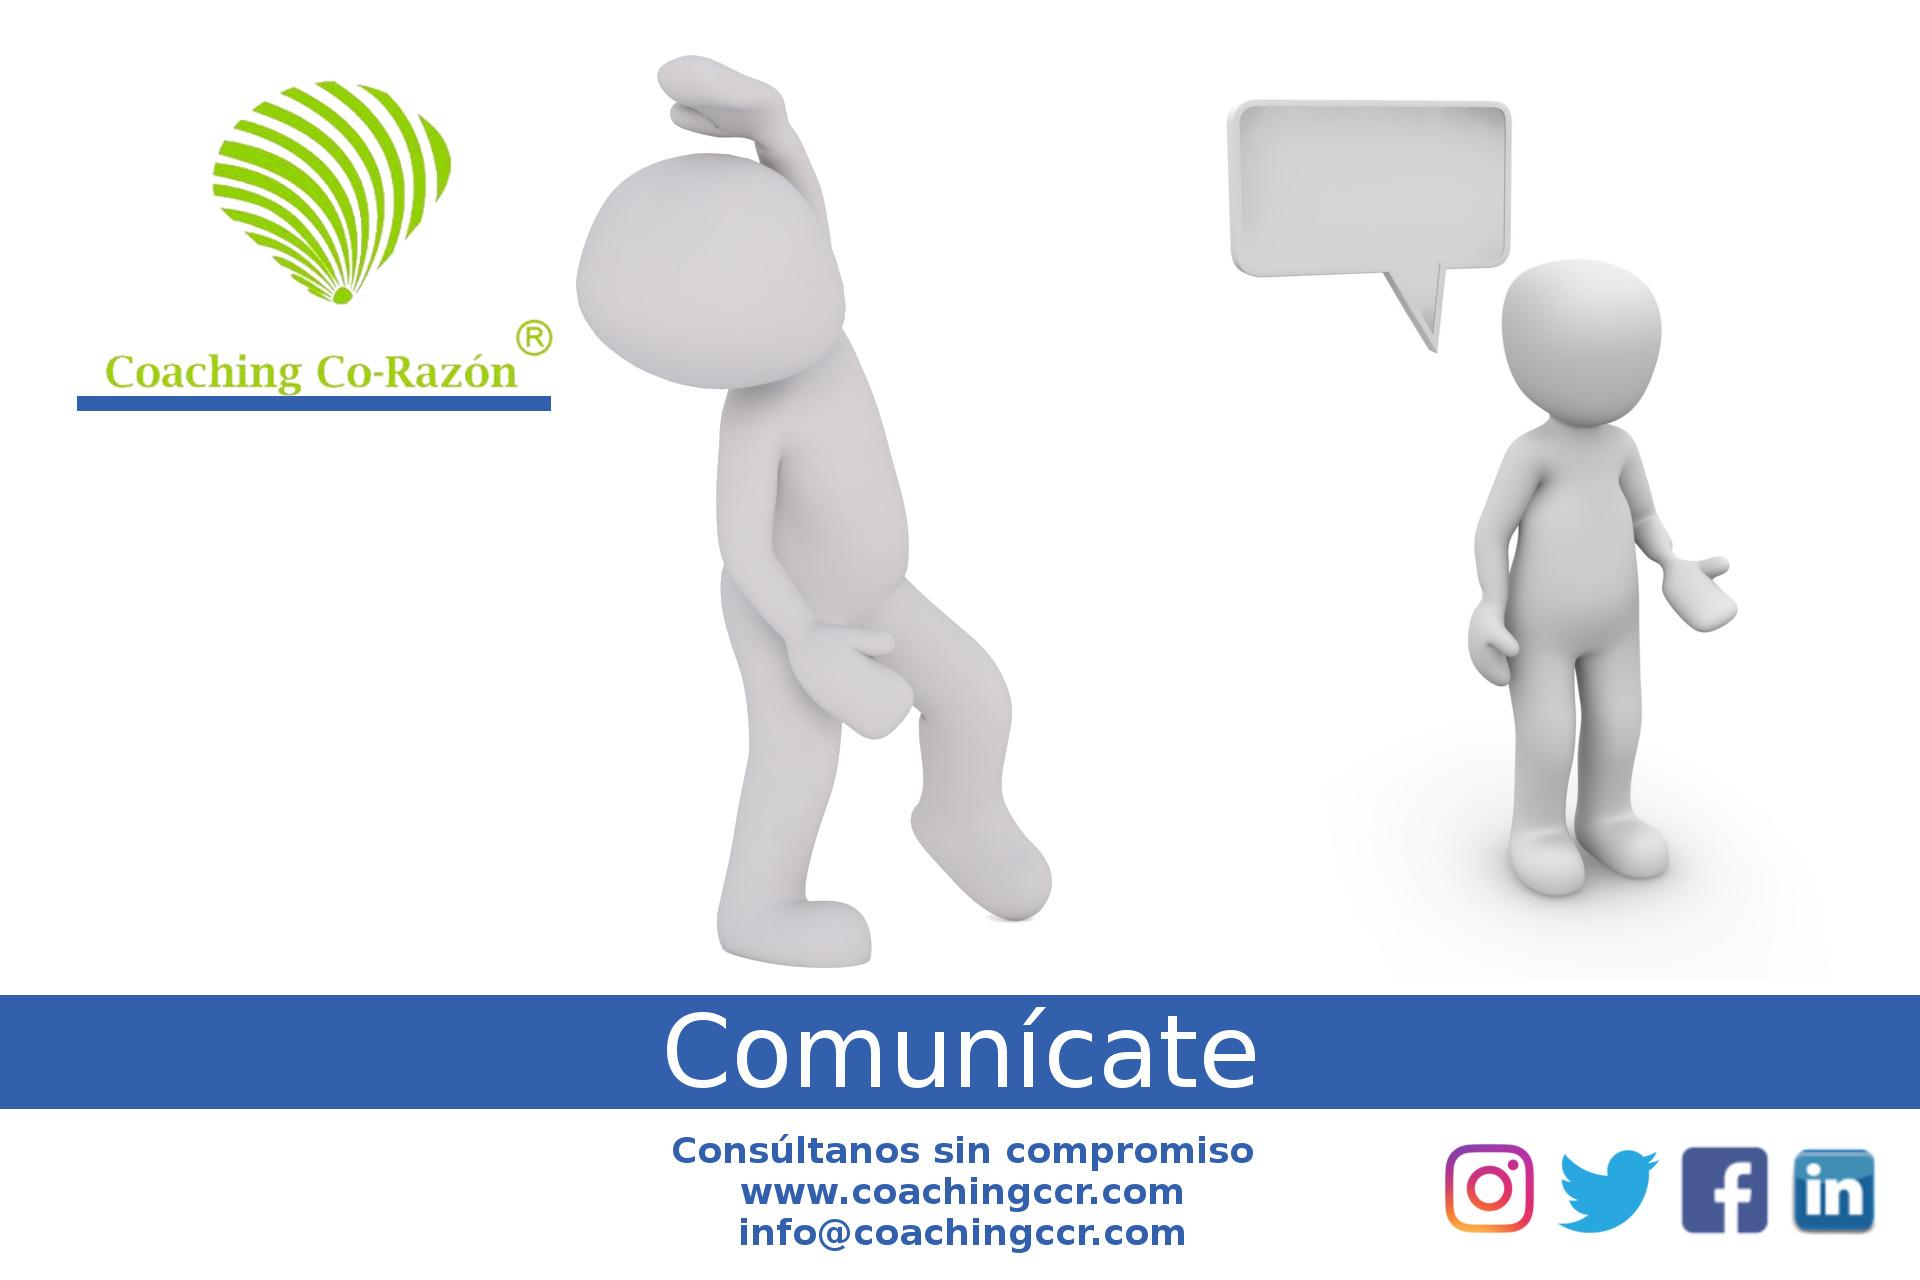 comunicate3